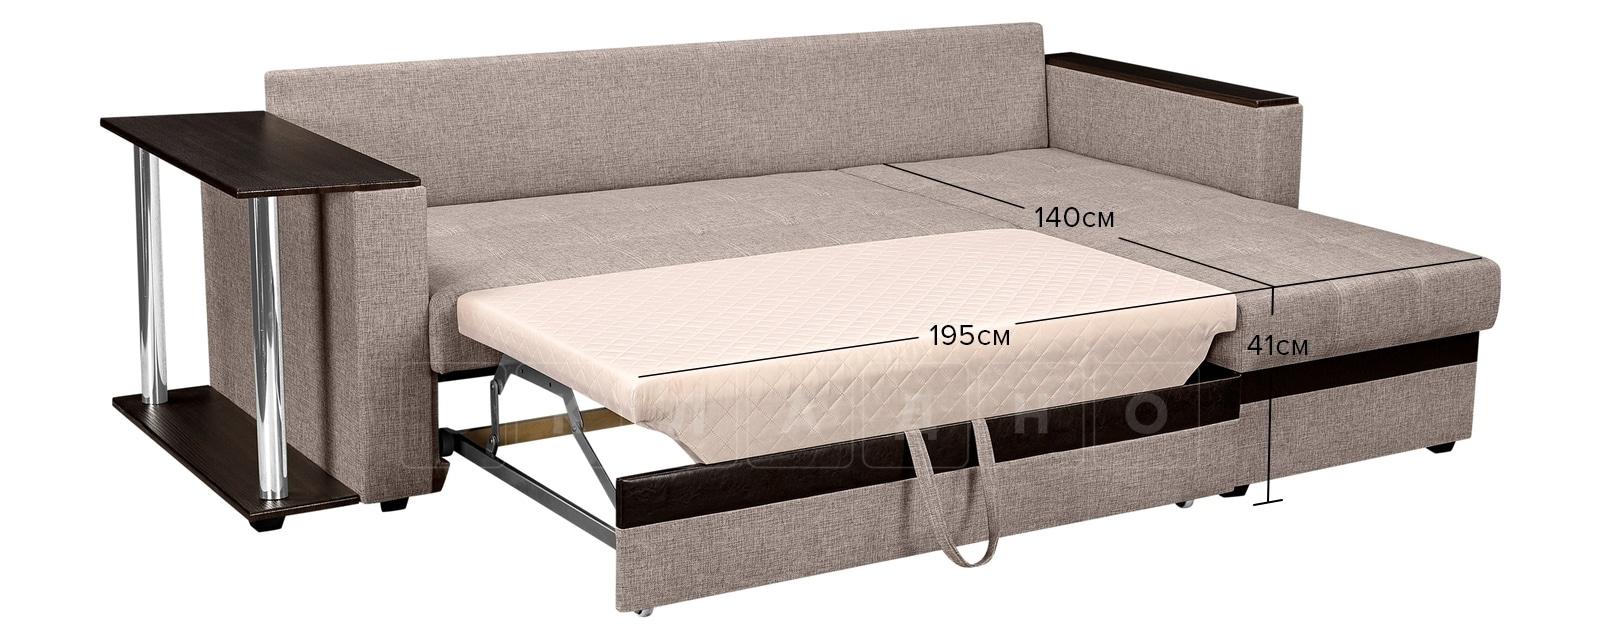 Угловой диван Атланта рогожка темно-бежевого цвета фото 10 | интернет-магазин Складно